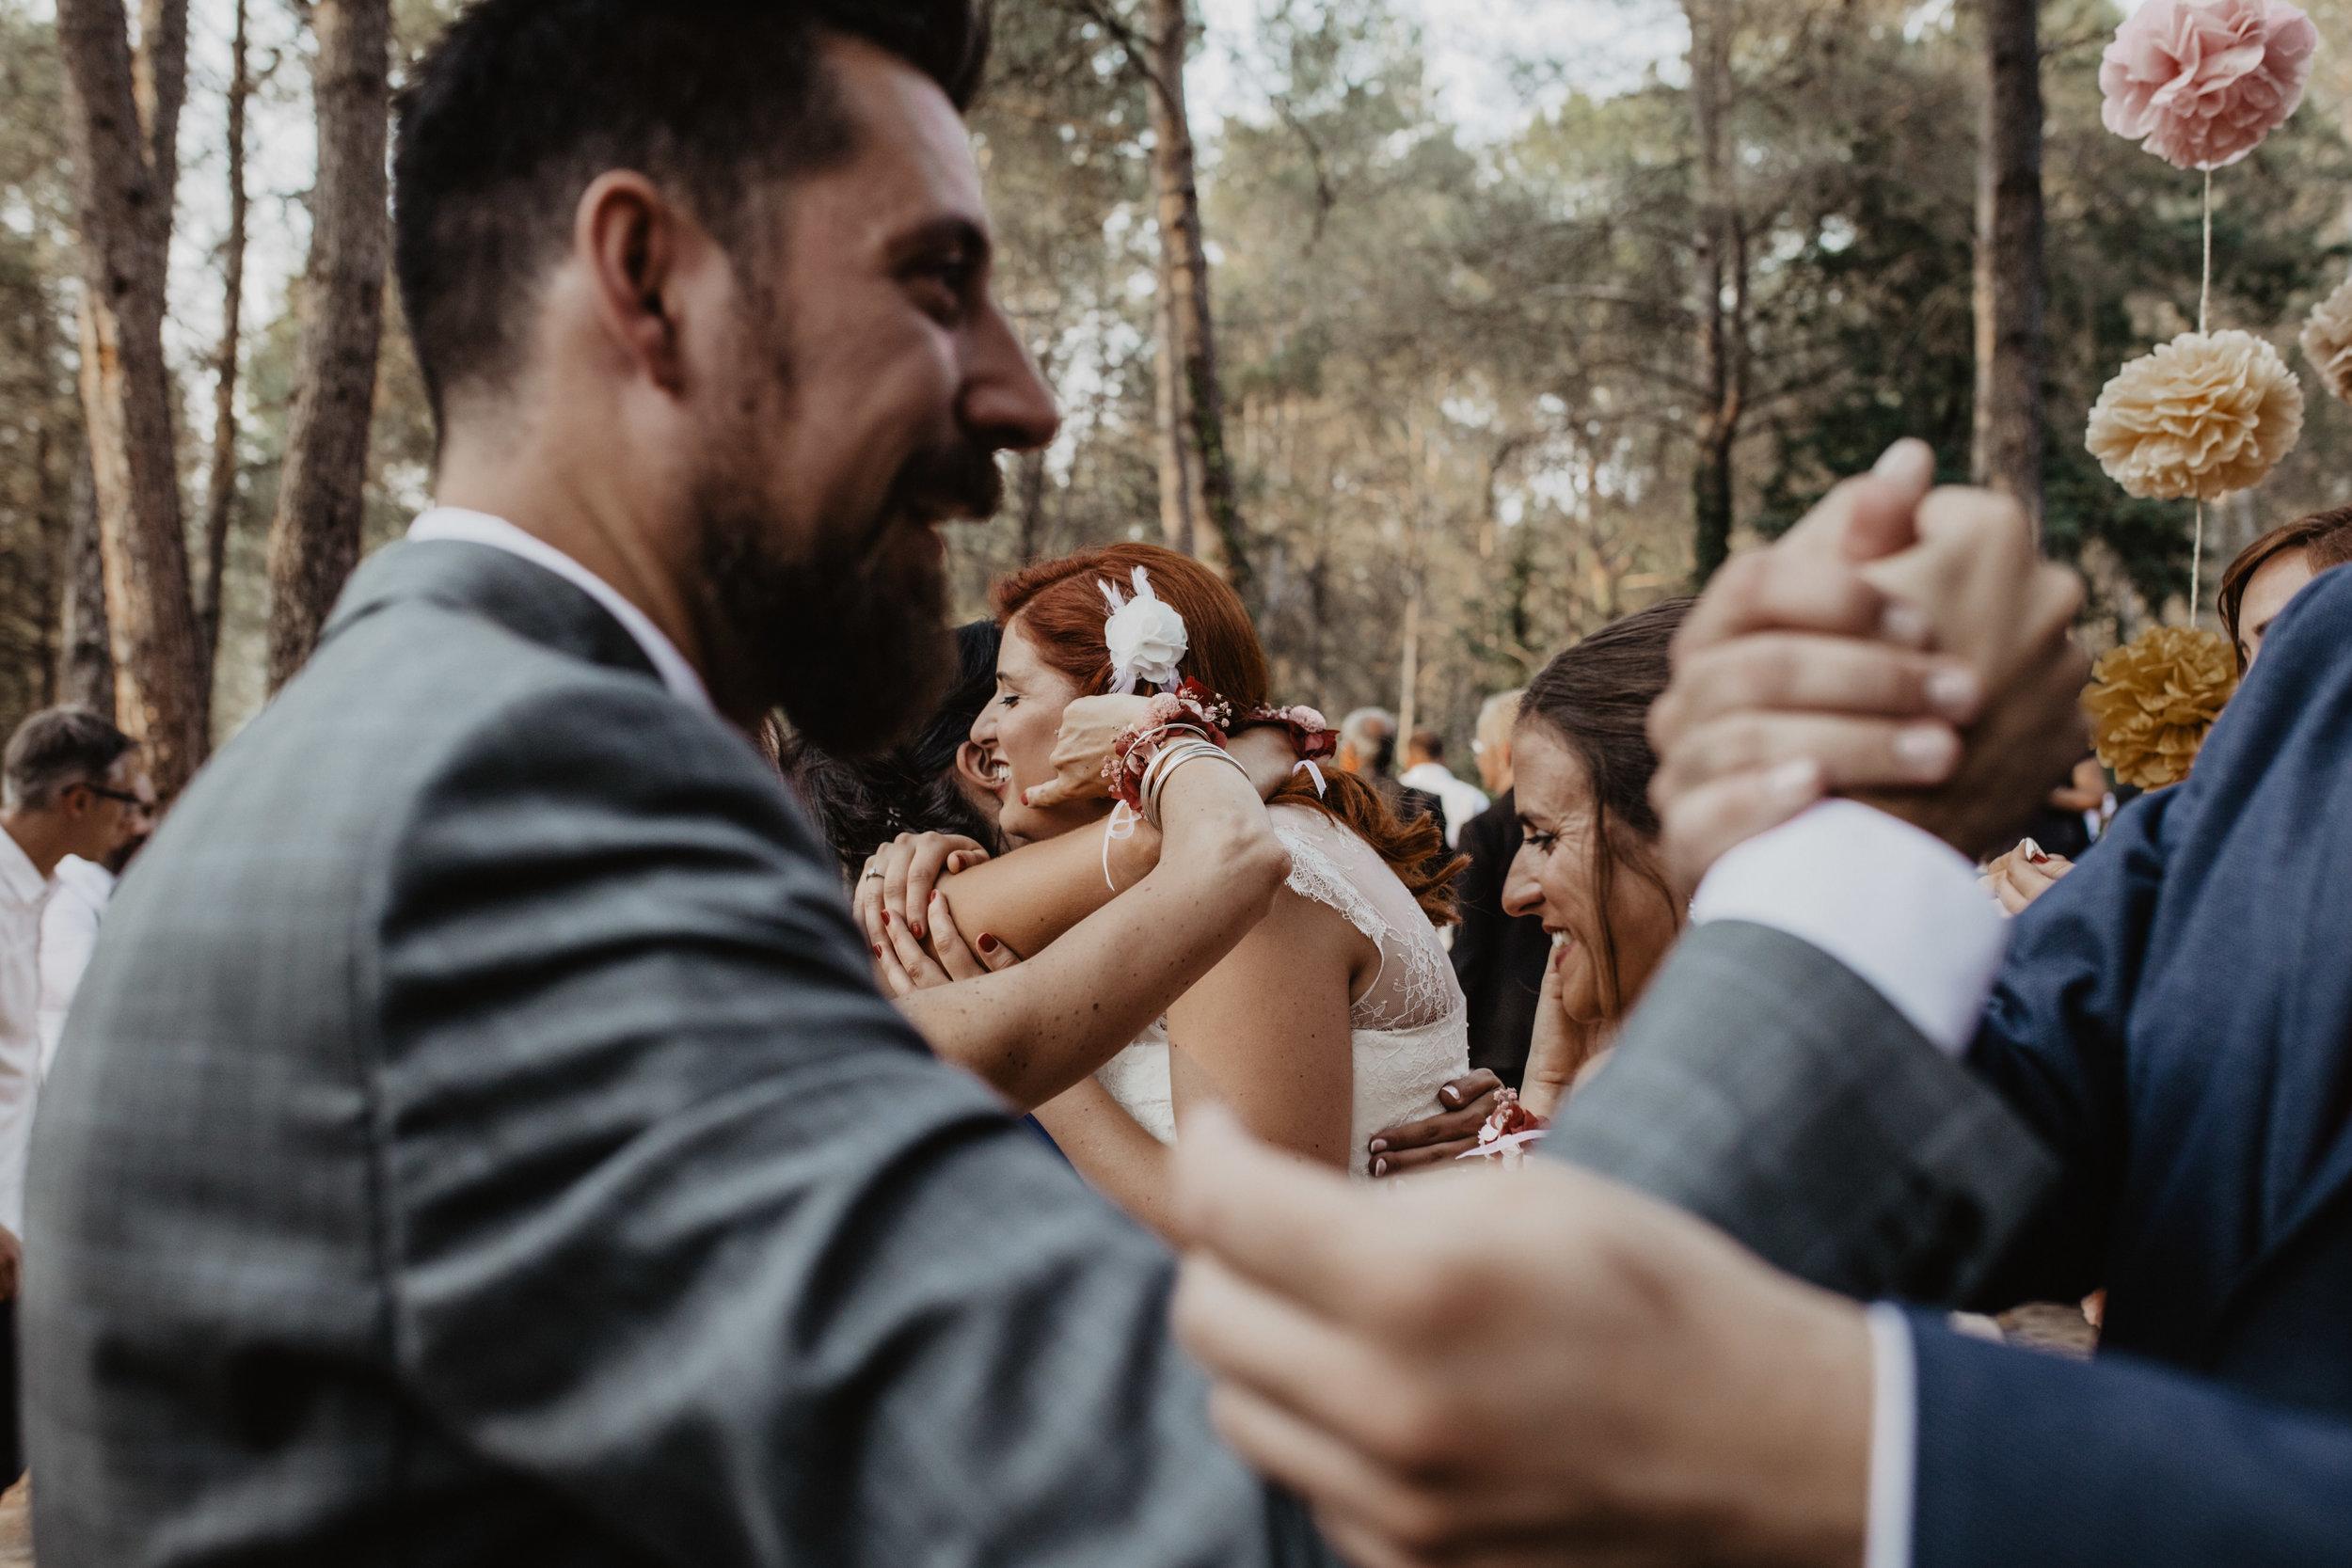 thenortherngirlphotography_photography_thenortherngirl_rebeccascabros_wedding_weddingphotography_masialagarrigadecastelladral_joaniemma_bodaenbarcelona_weddingphotographer_emmaijoan-420.jpg